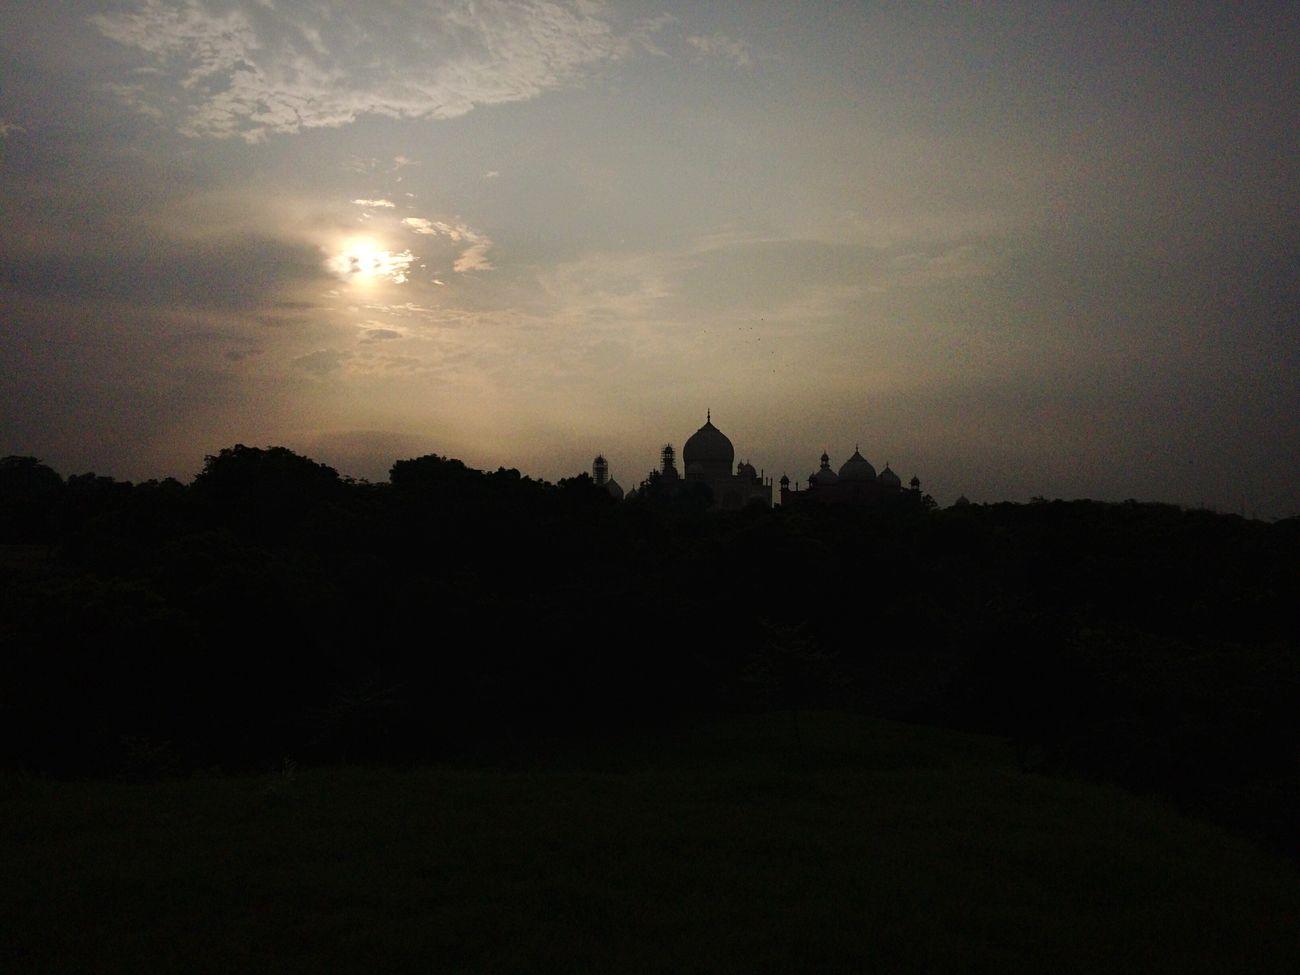 Sky No People Sunset Architecture Landscape Day Taj Mahal Mughalarchitecture Love History First Eyeem Photo